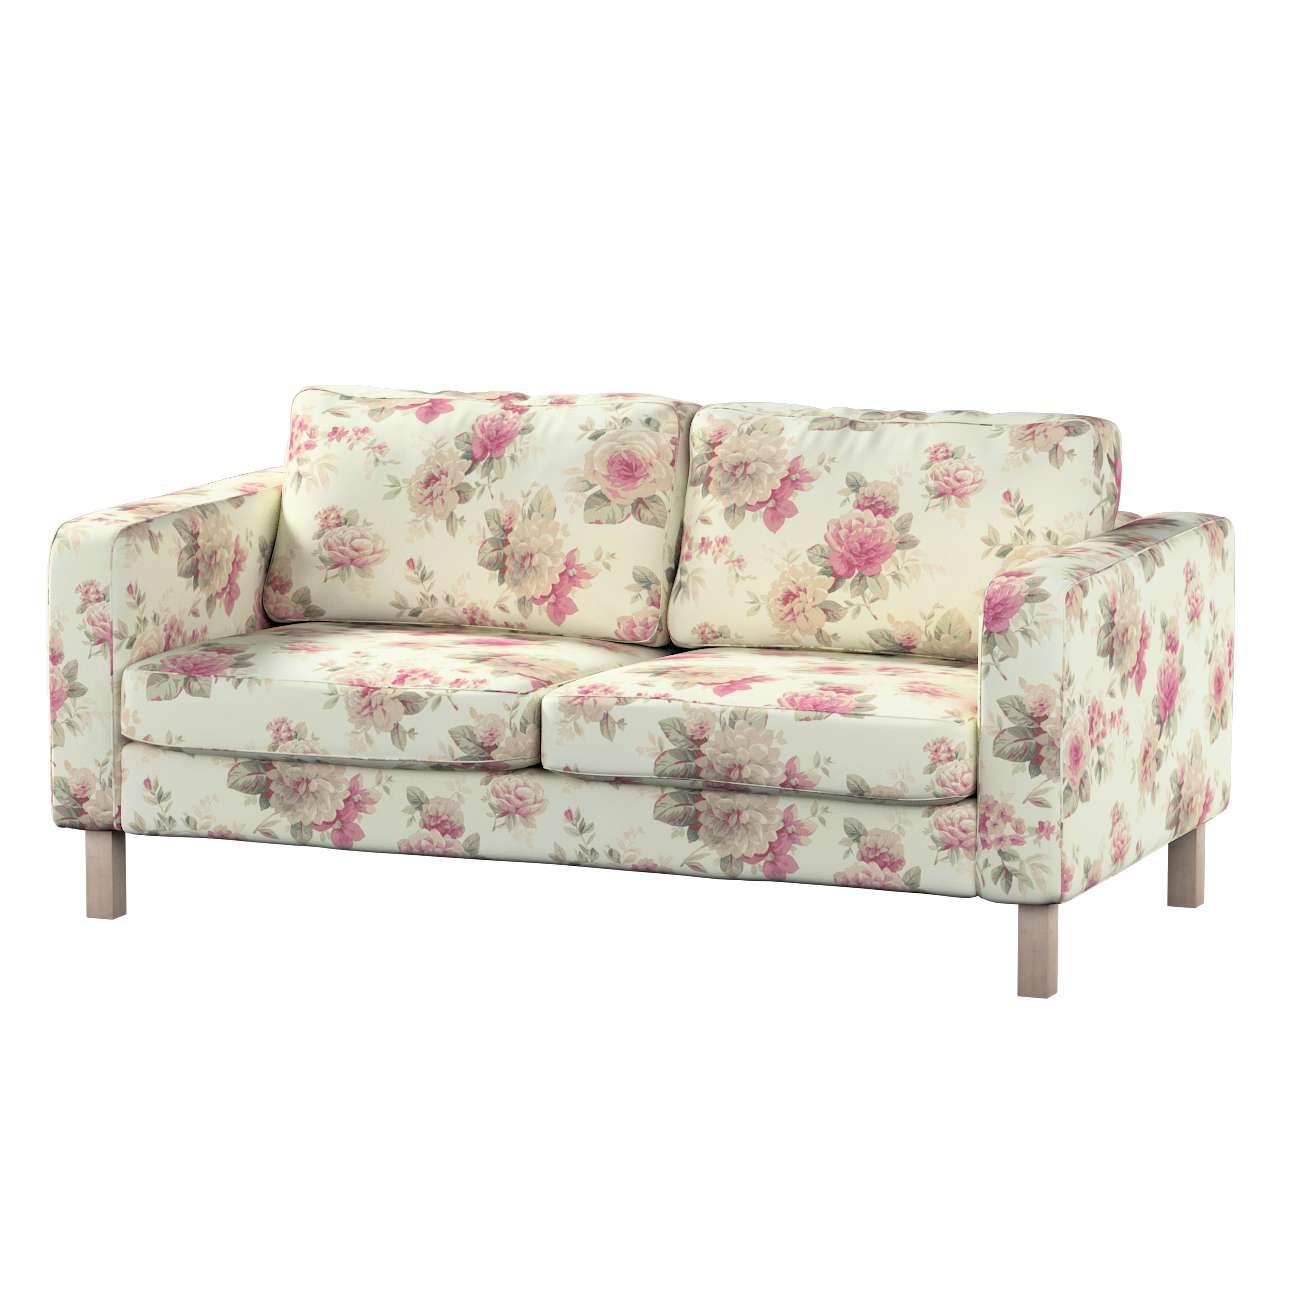 KARSLTAD dvivietės sofos užvalkalas Karlstad 2-vietės sofos užvalkalas kolekcijoje Mirella, audinys: 141-07